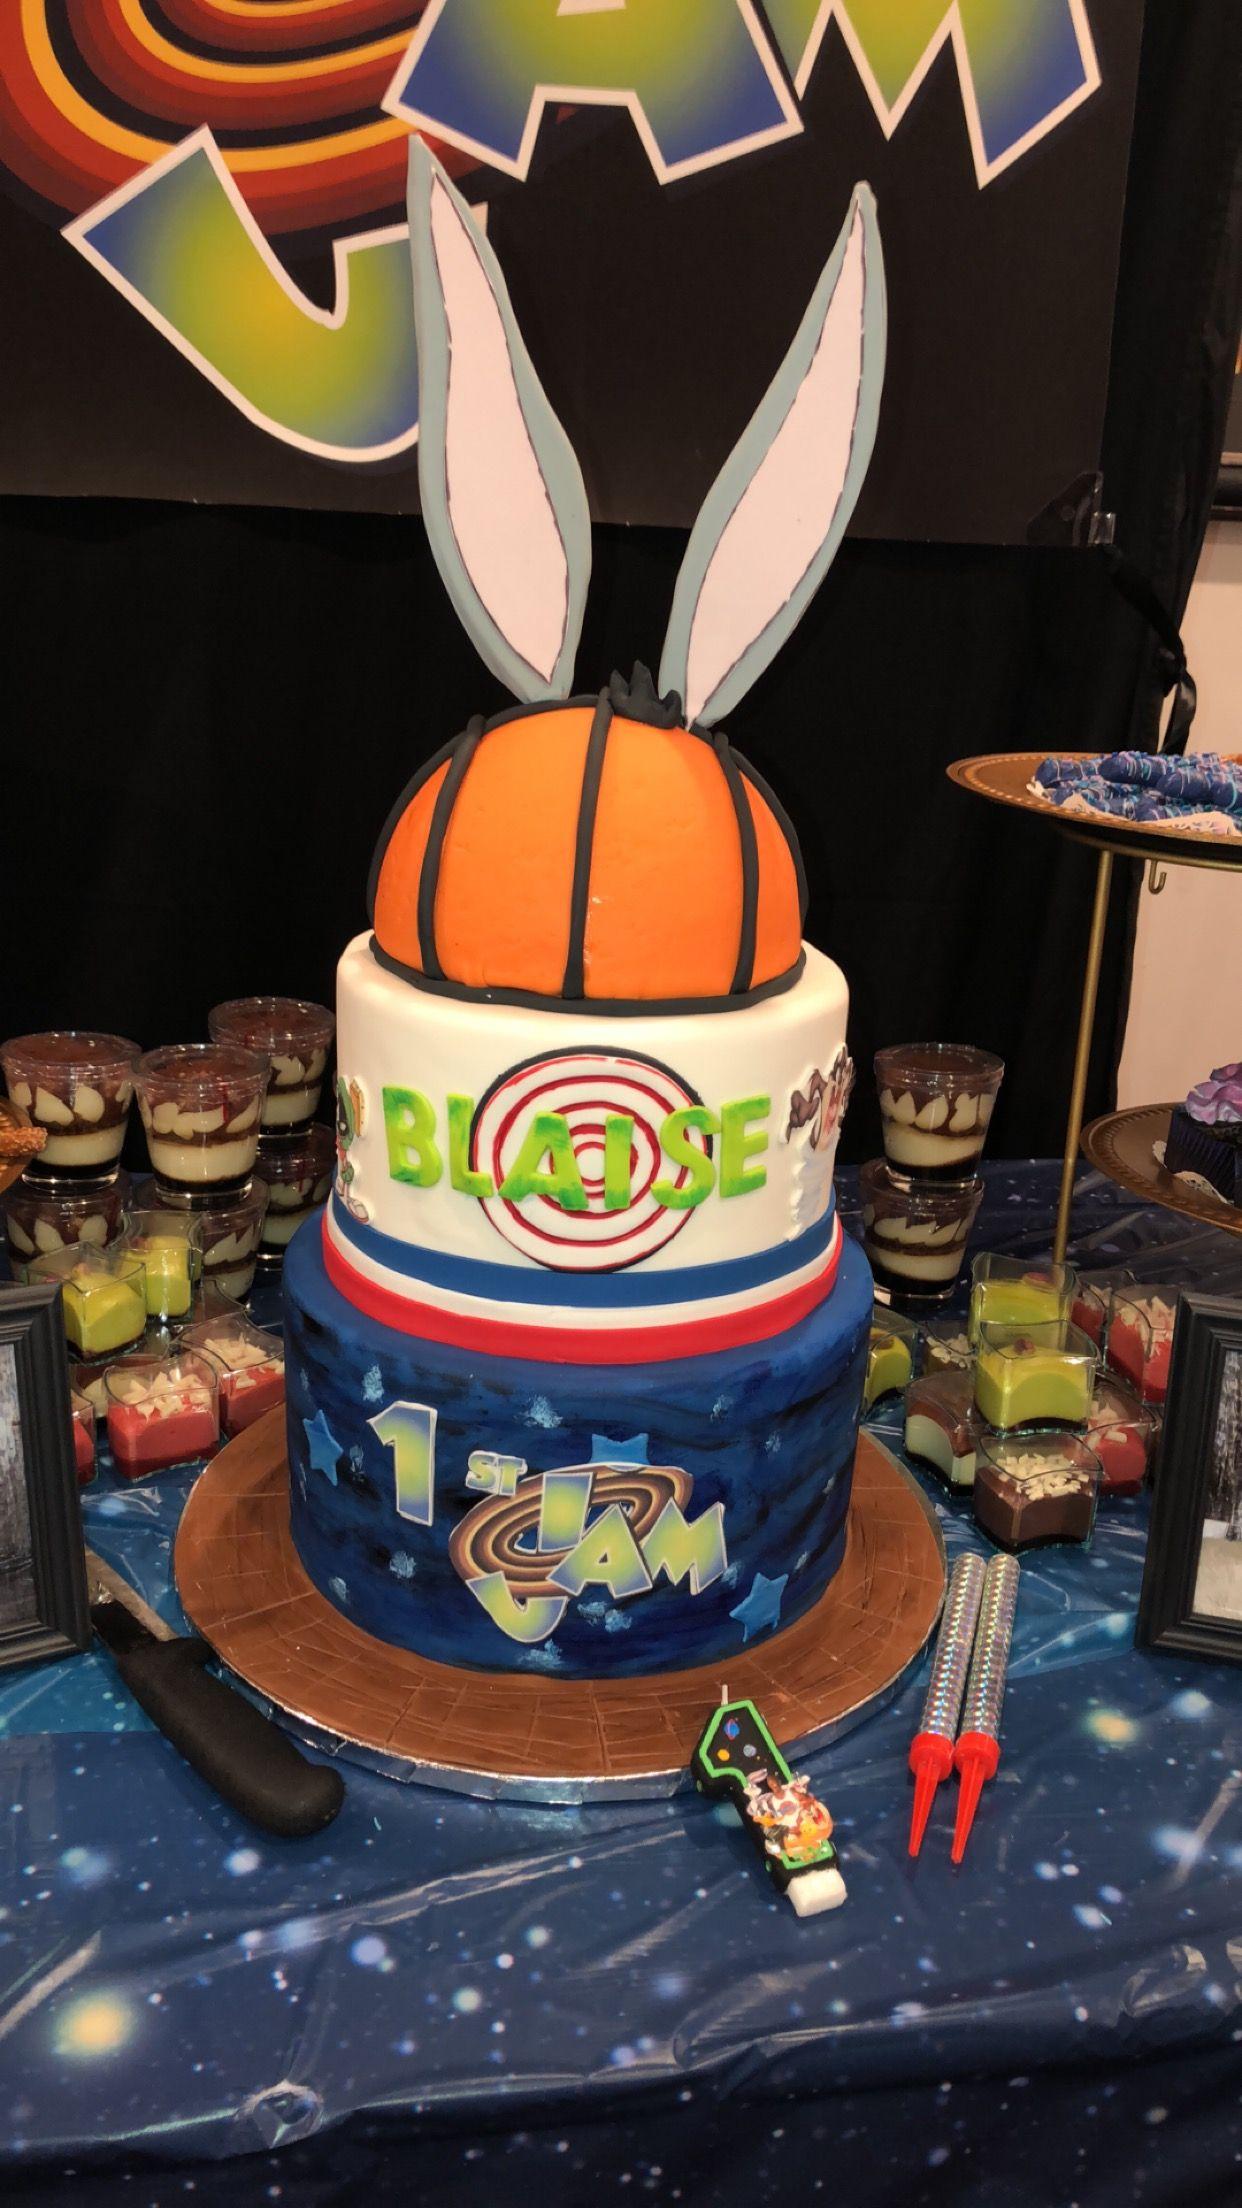 Space jam cake | Basketball themed birthday party, Baby boy 1st birthday  party, Space jam theme